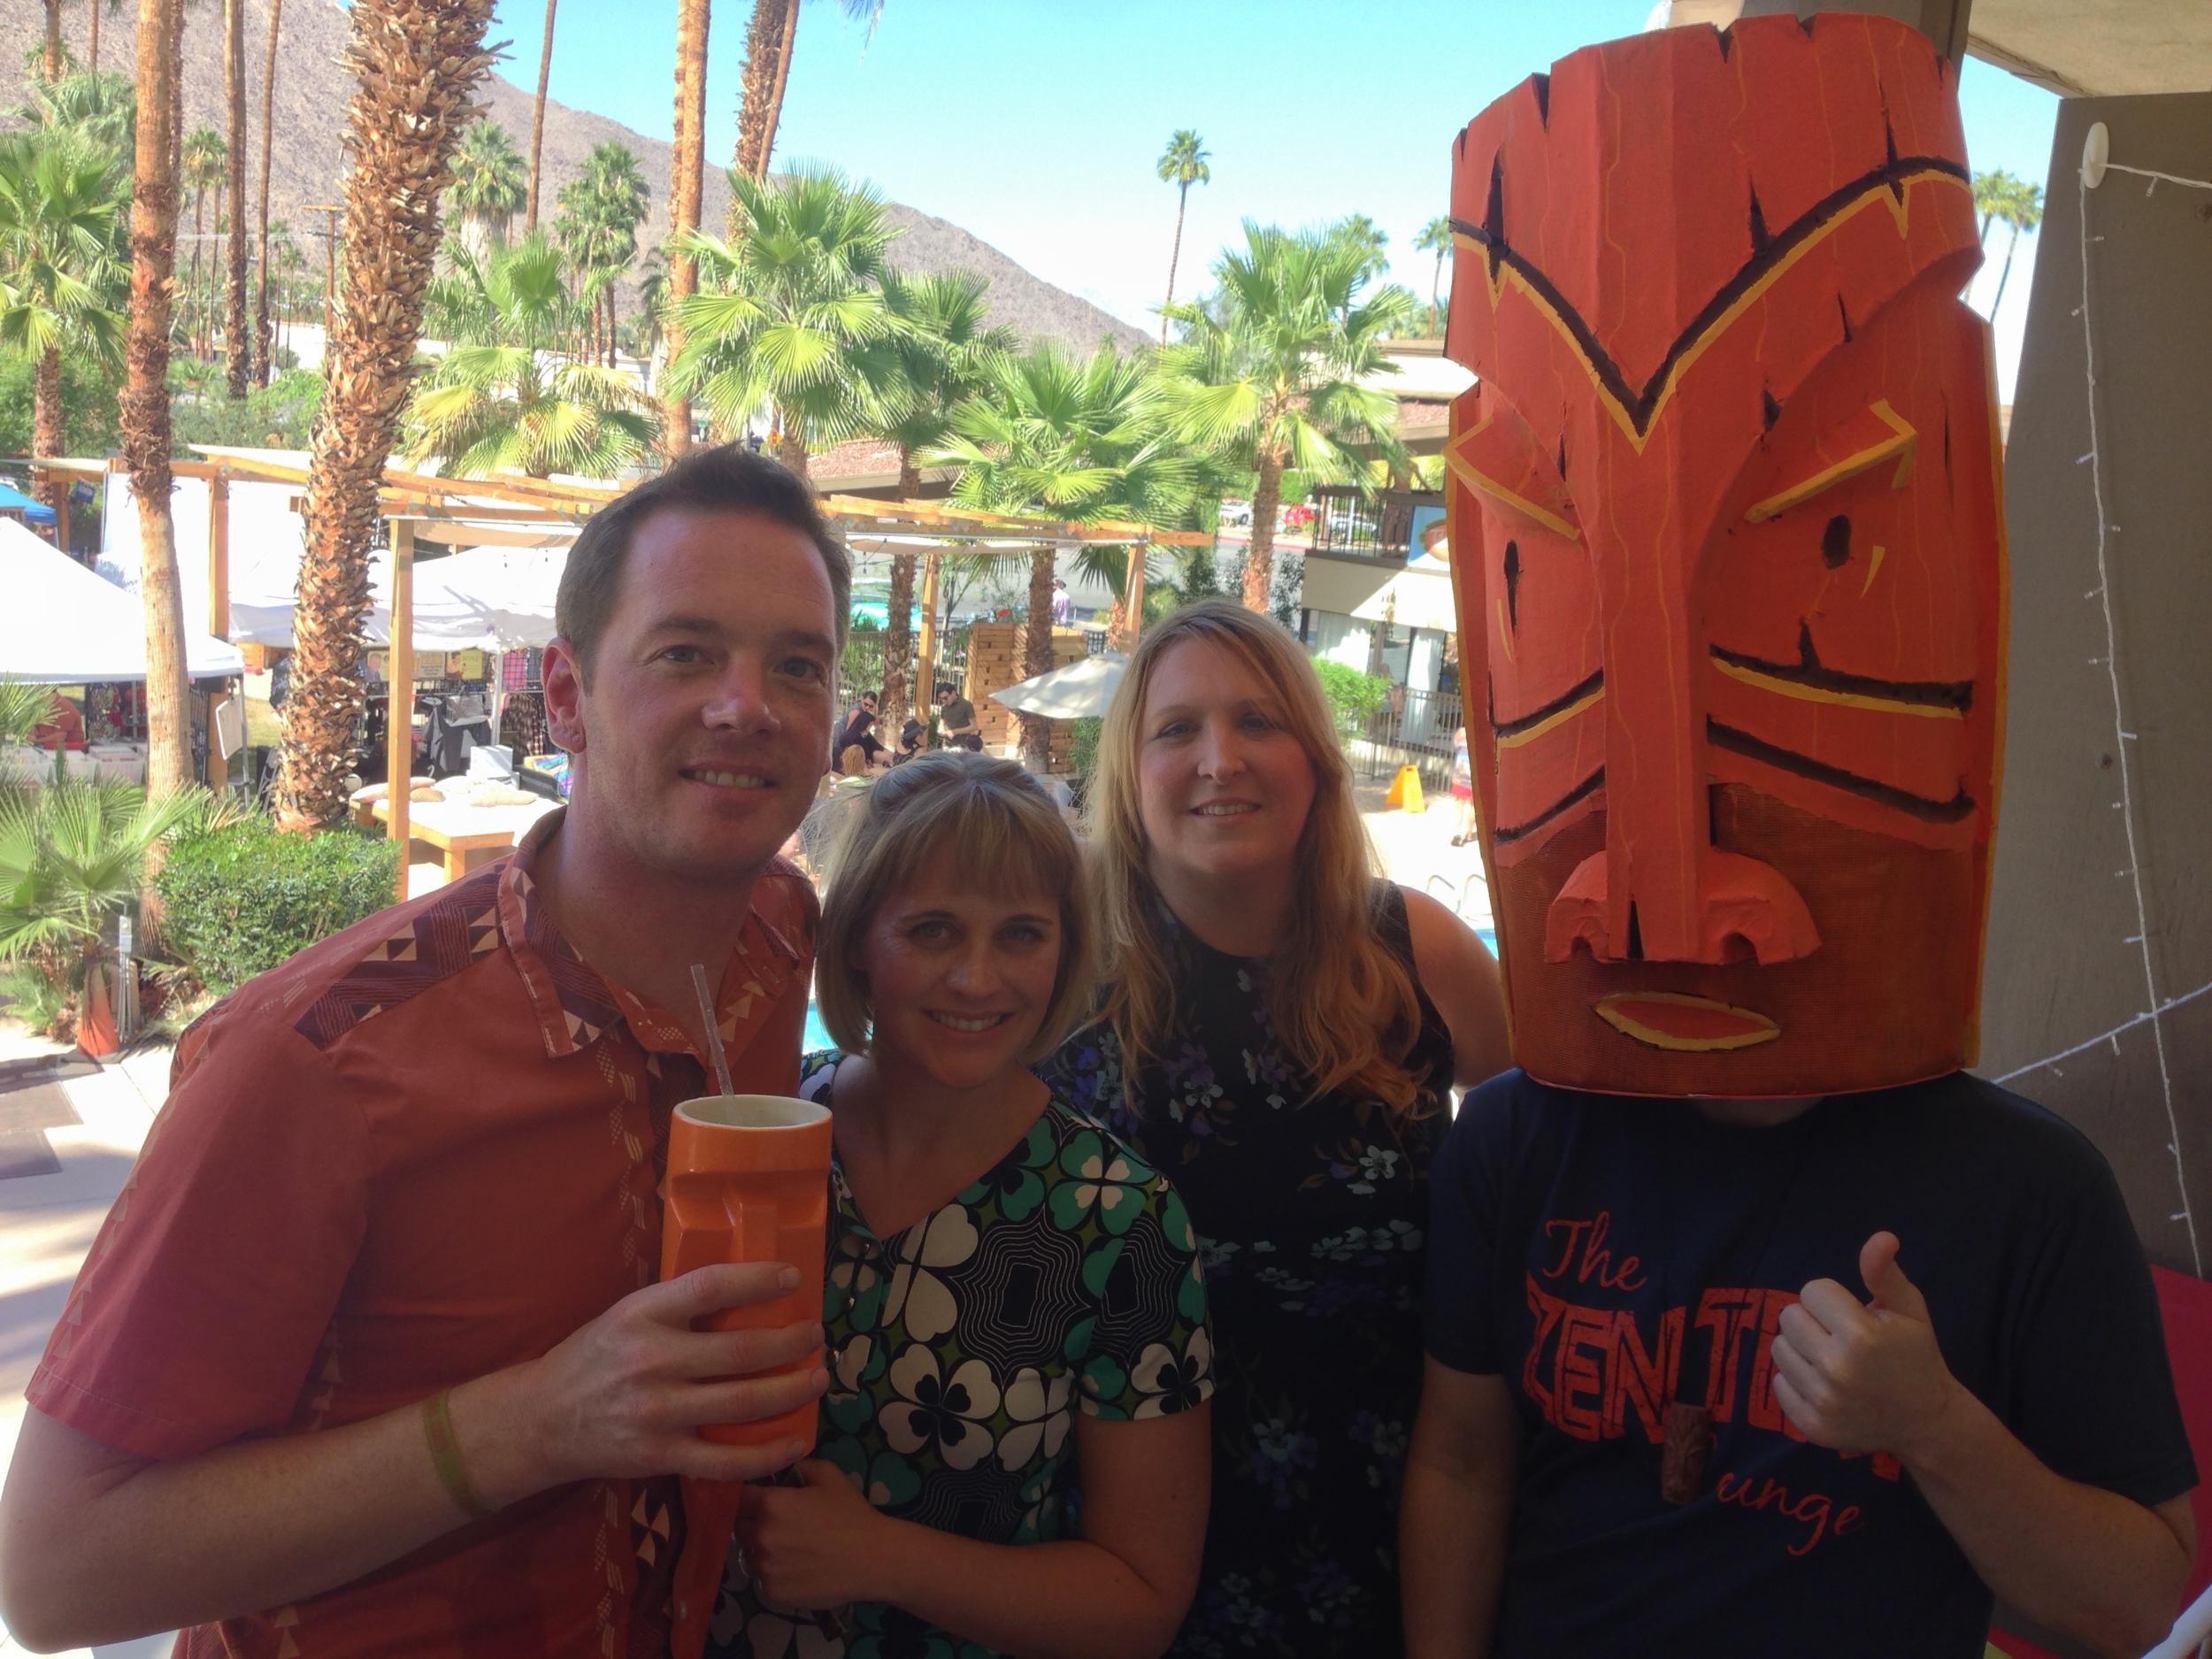 Sunshine, Starshine, Kalani and Mr. Tiki enjoying the Palm Springs weather at Mod-Palm Springs